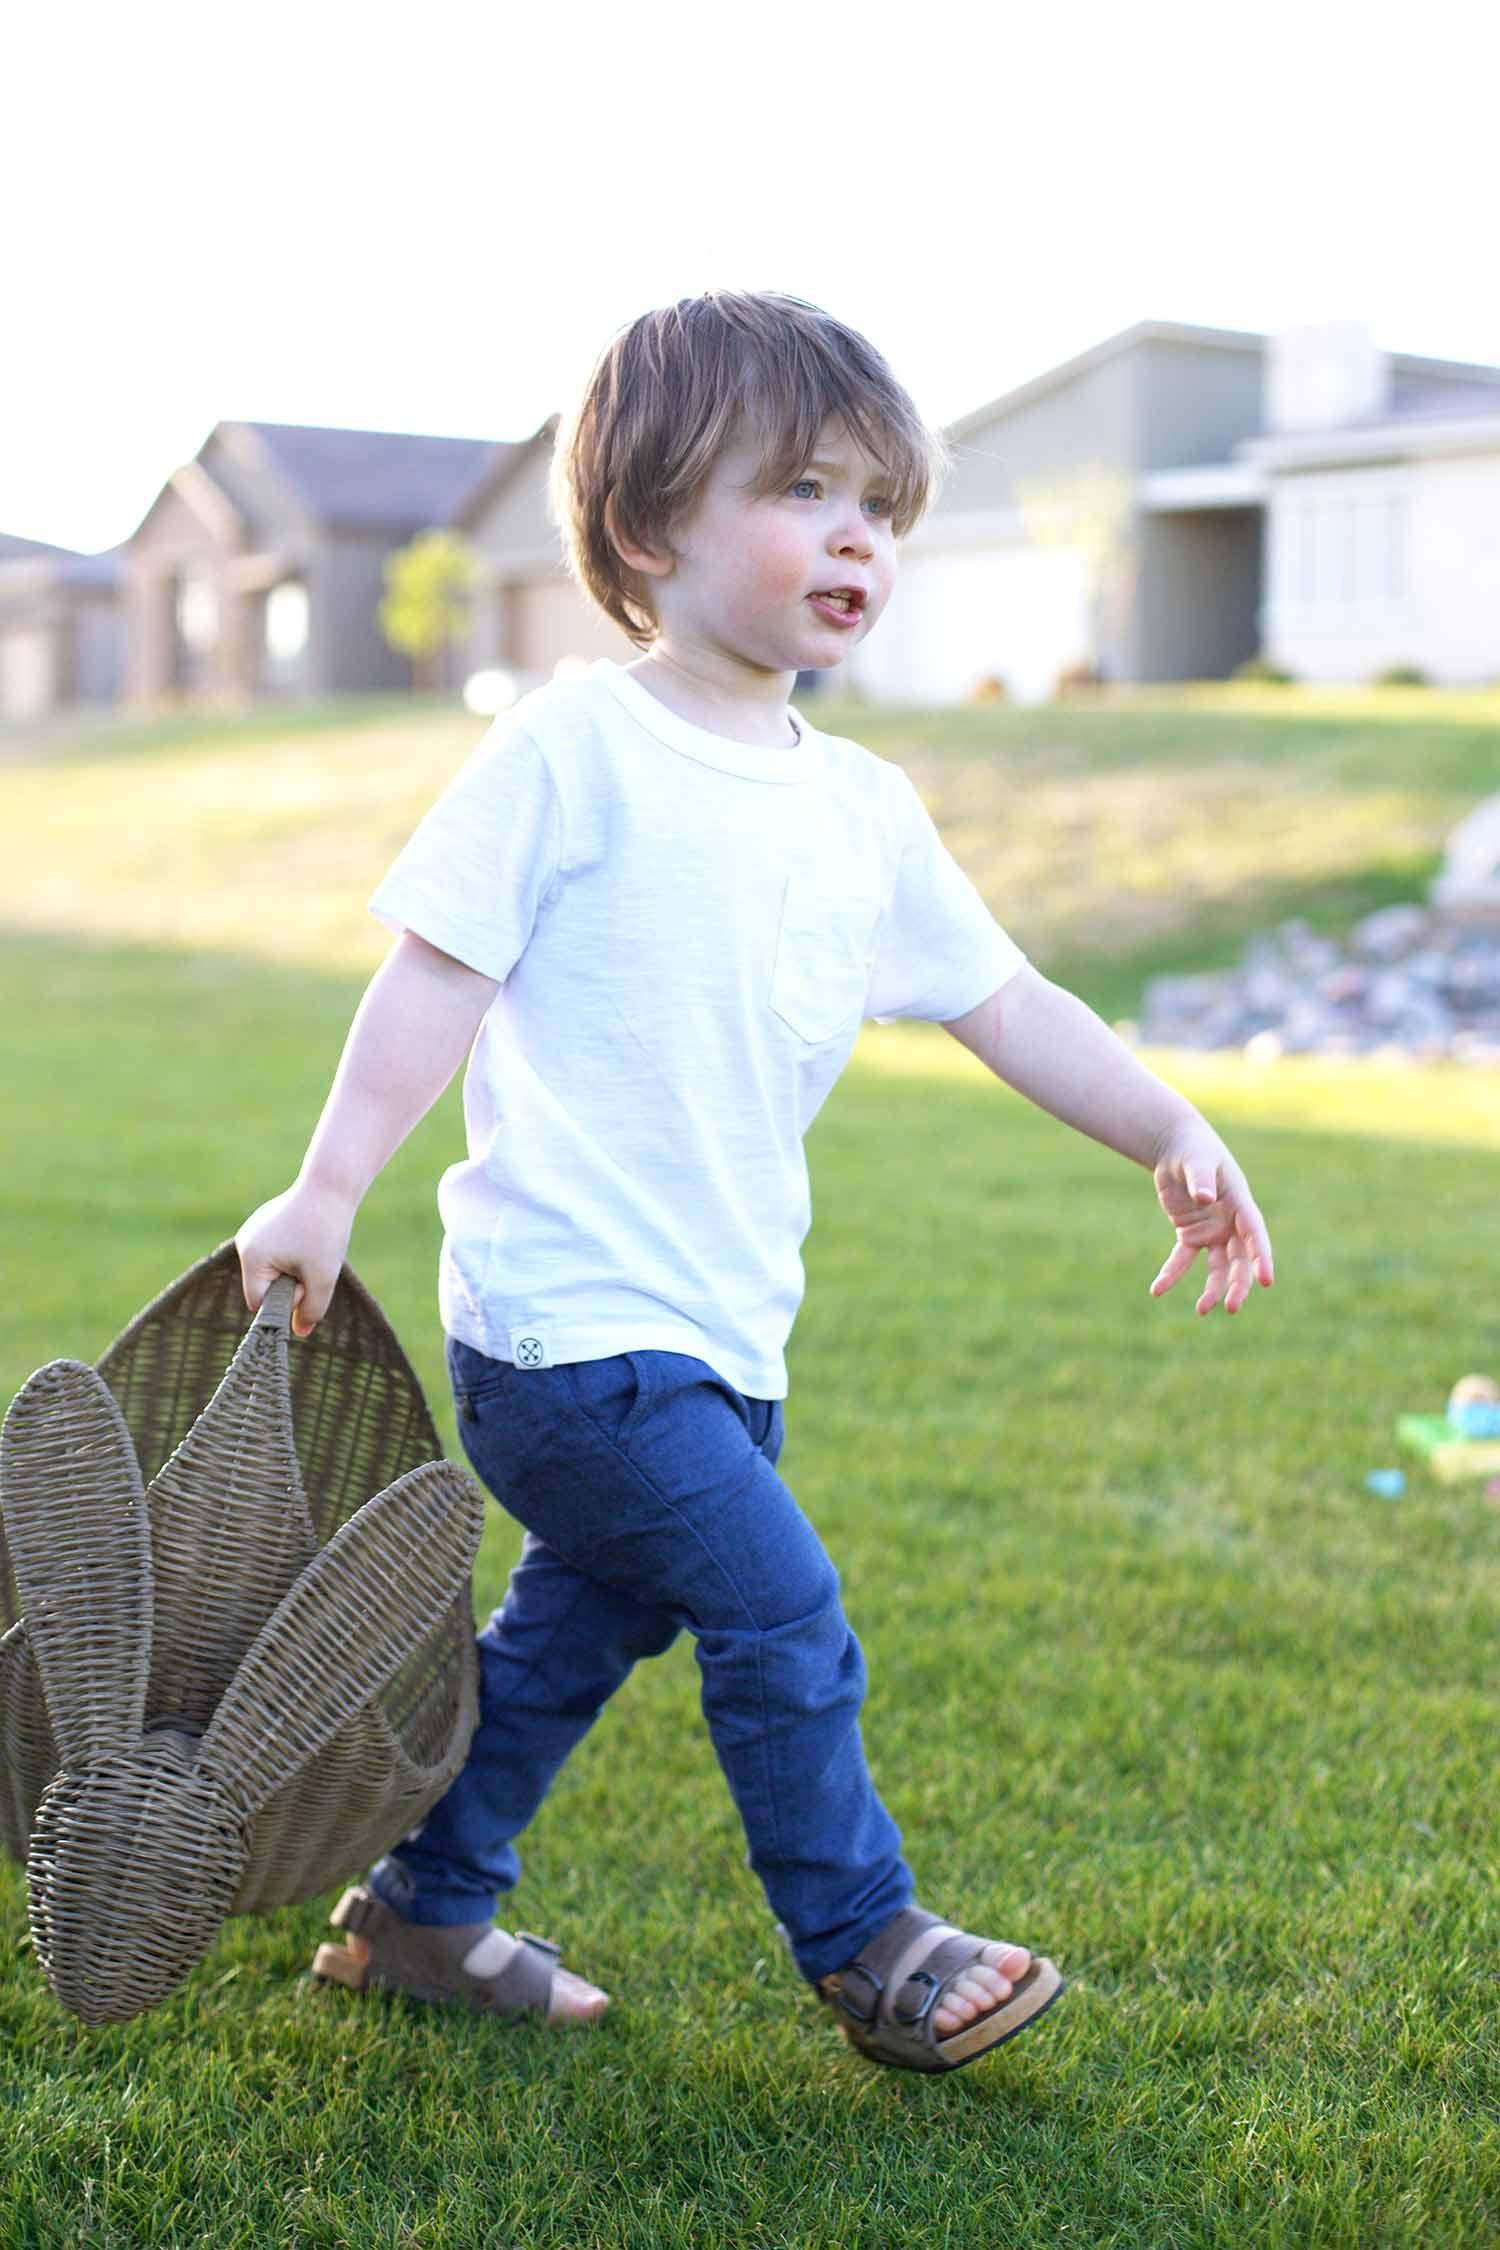 Easter picnic toddler boy walking with Easter basket